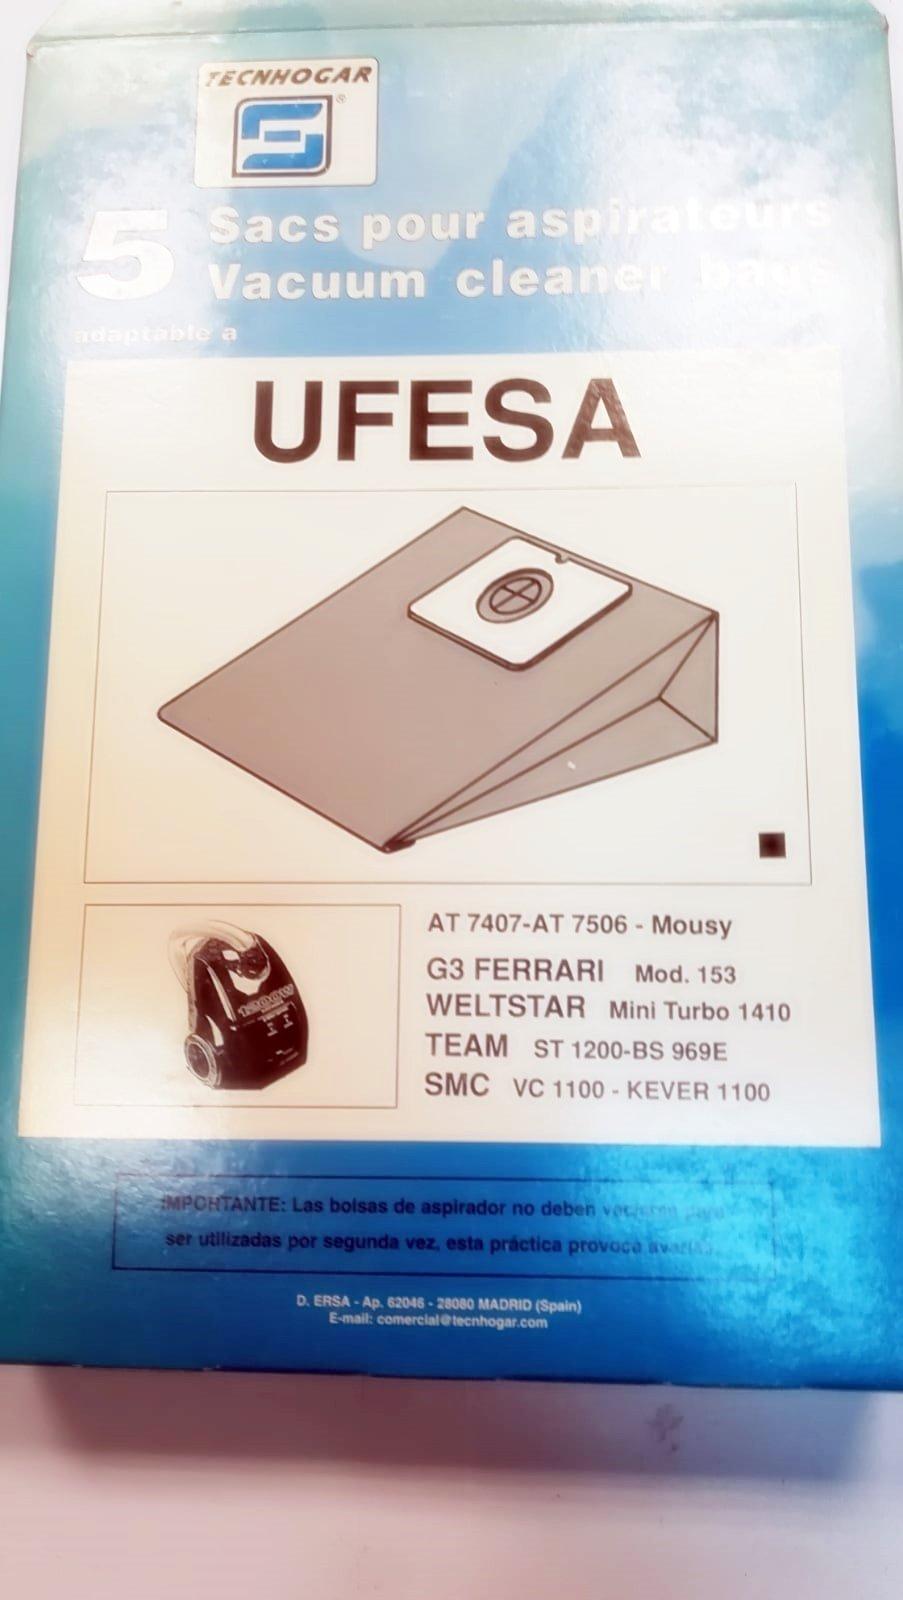 Taurus Bolsas Aspirador COMPATIBLES UFESA: Amazon.es: Hogar